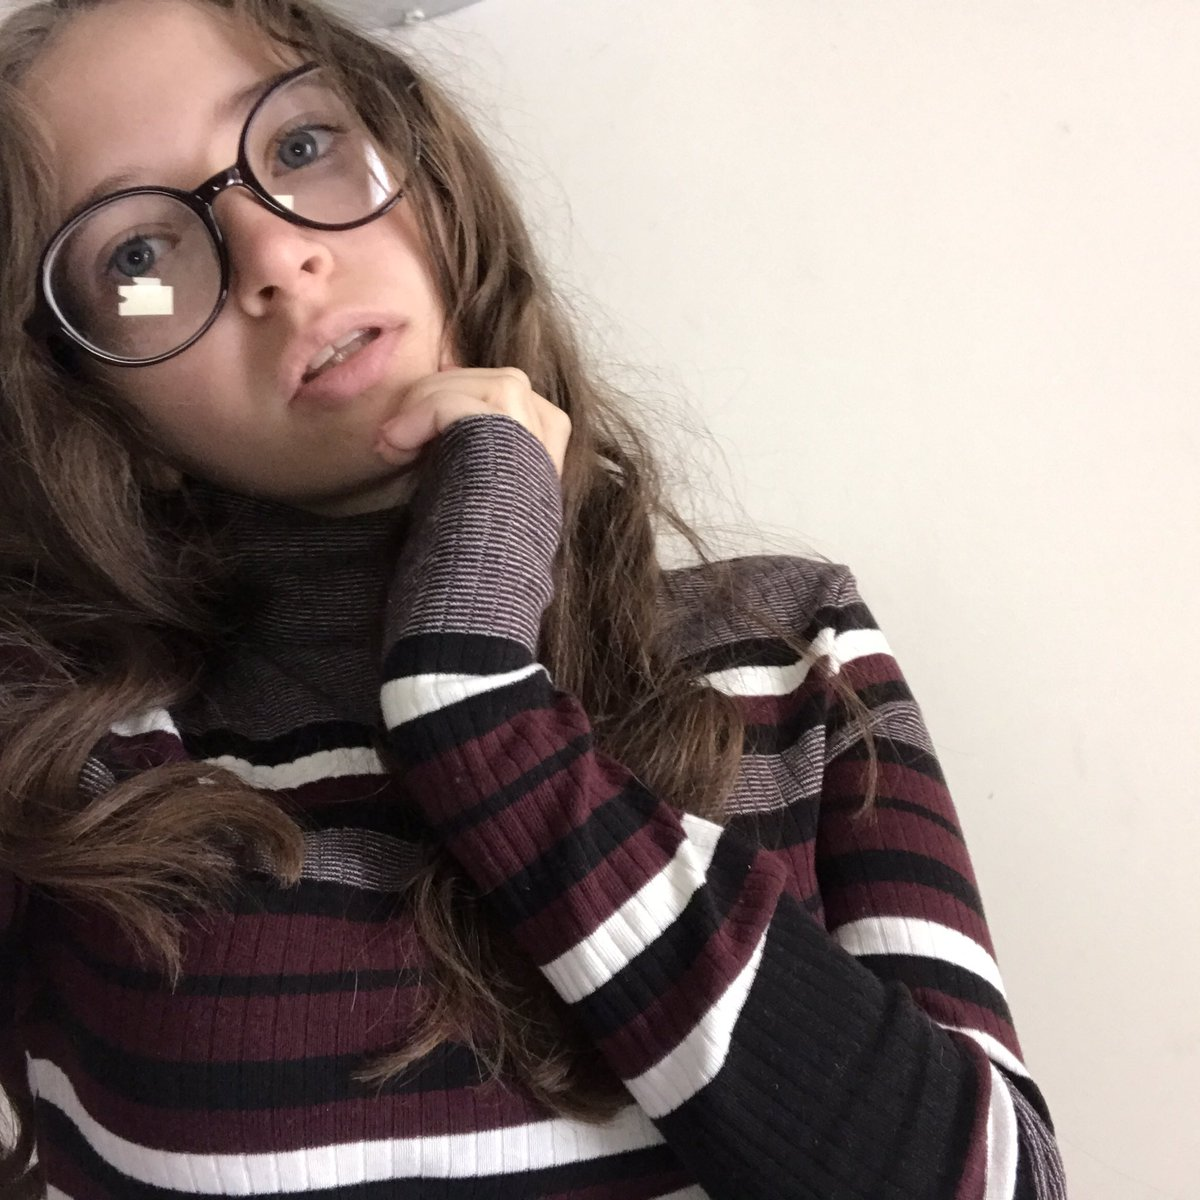 Looking glasses